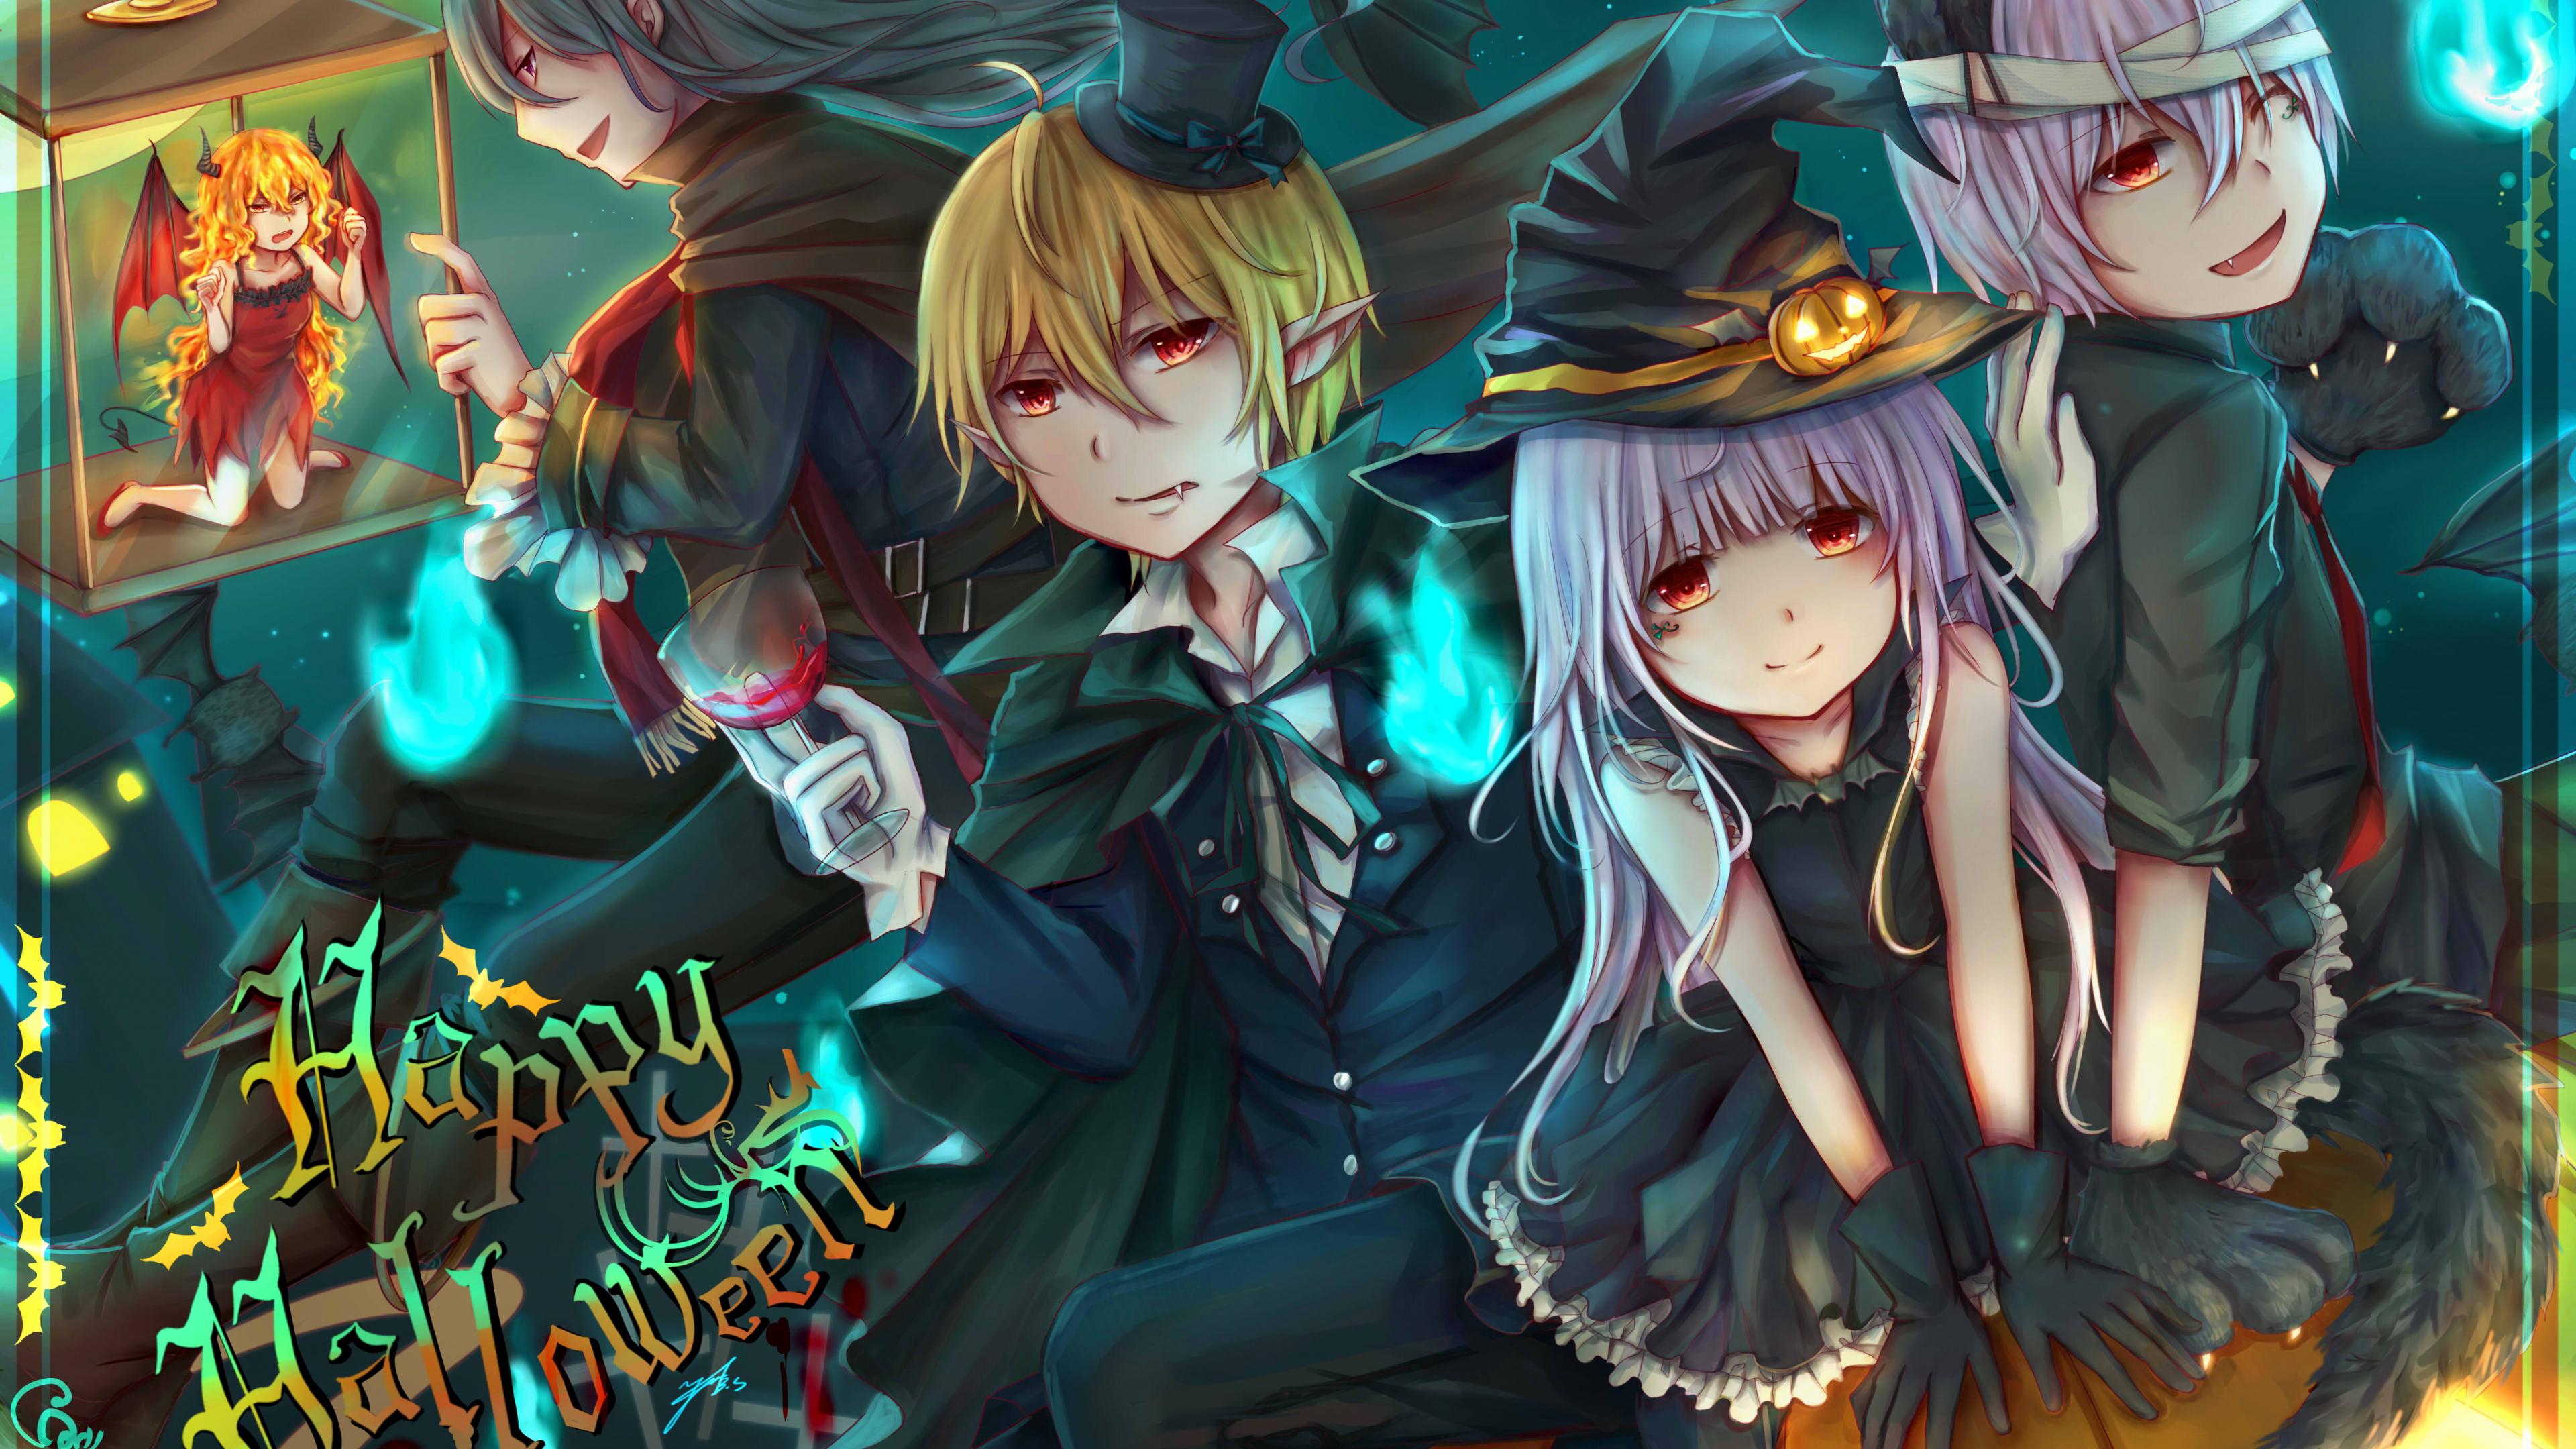 Desktop Wallpaper Anime, Halloween, Anime Girls And Boys, Friends